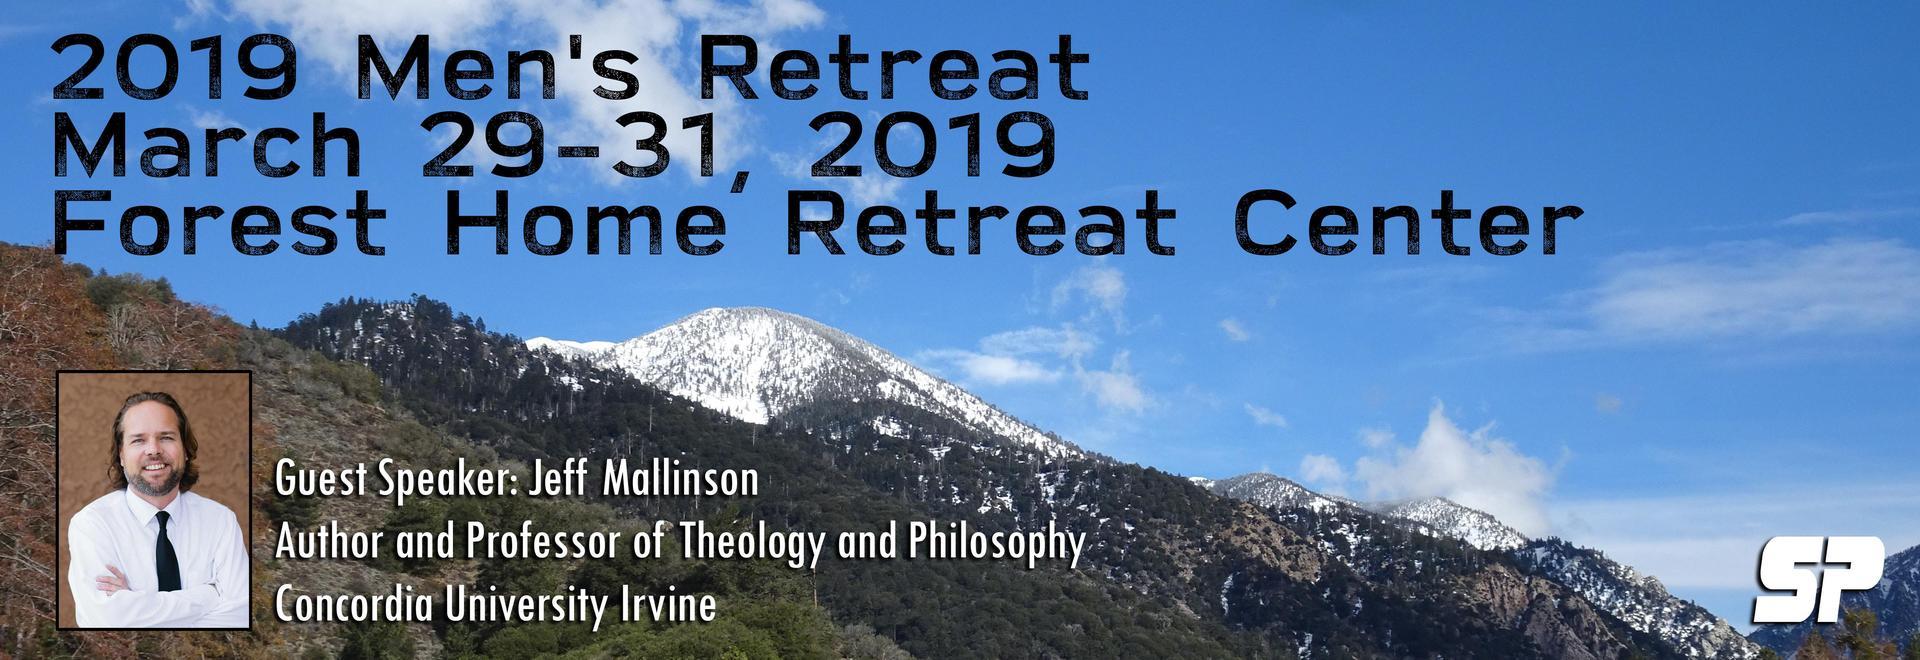 2019 Men's Retreat